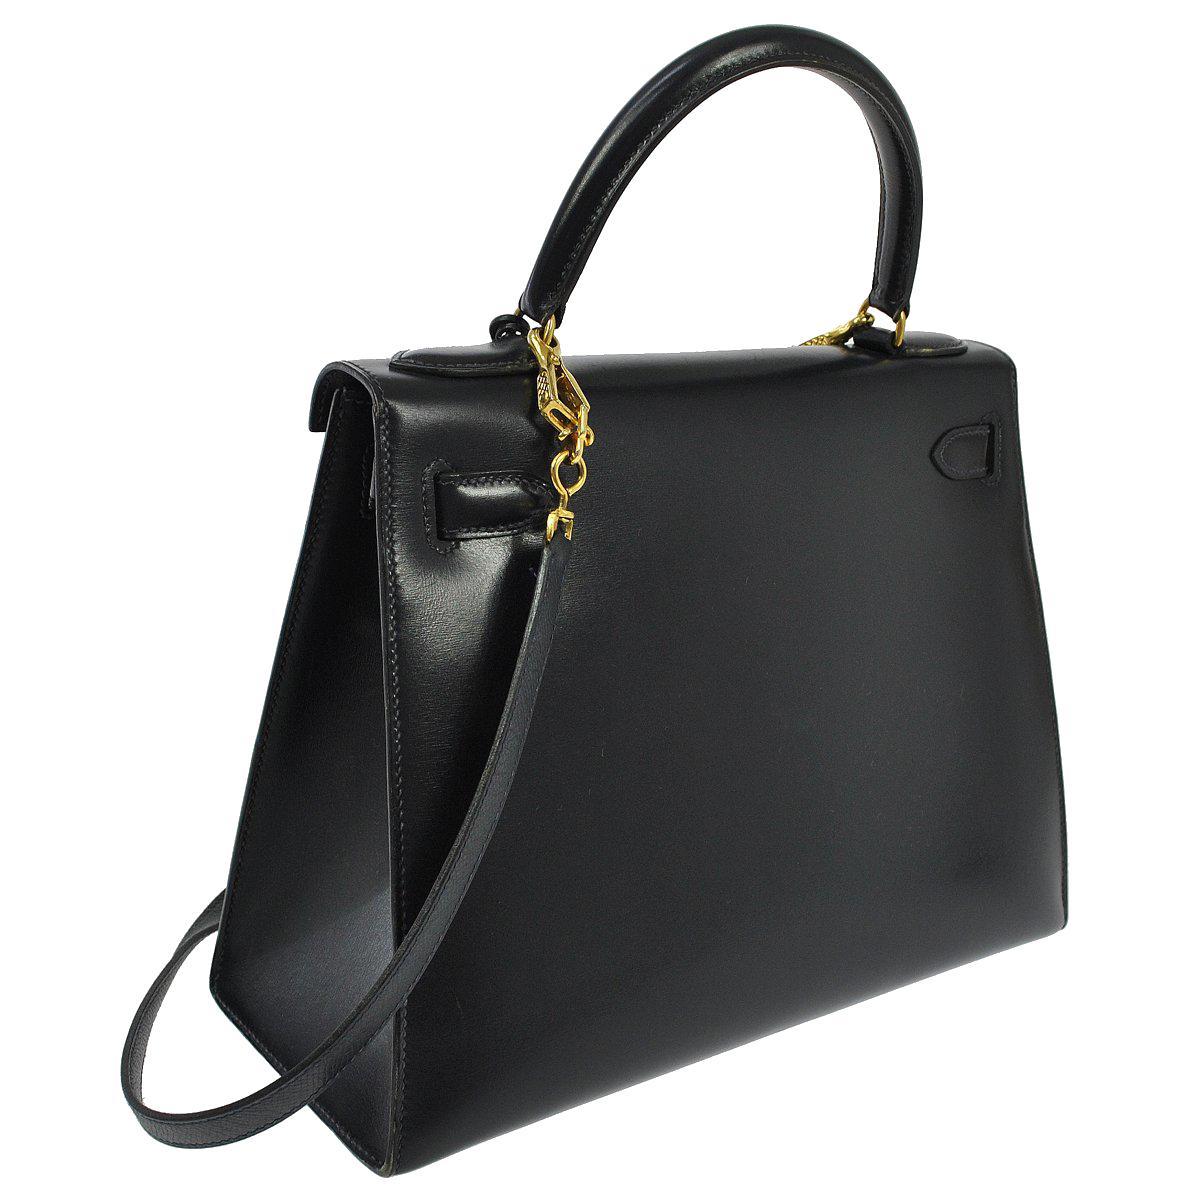 Sac Hermès Kelly 28 Sellier Noir